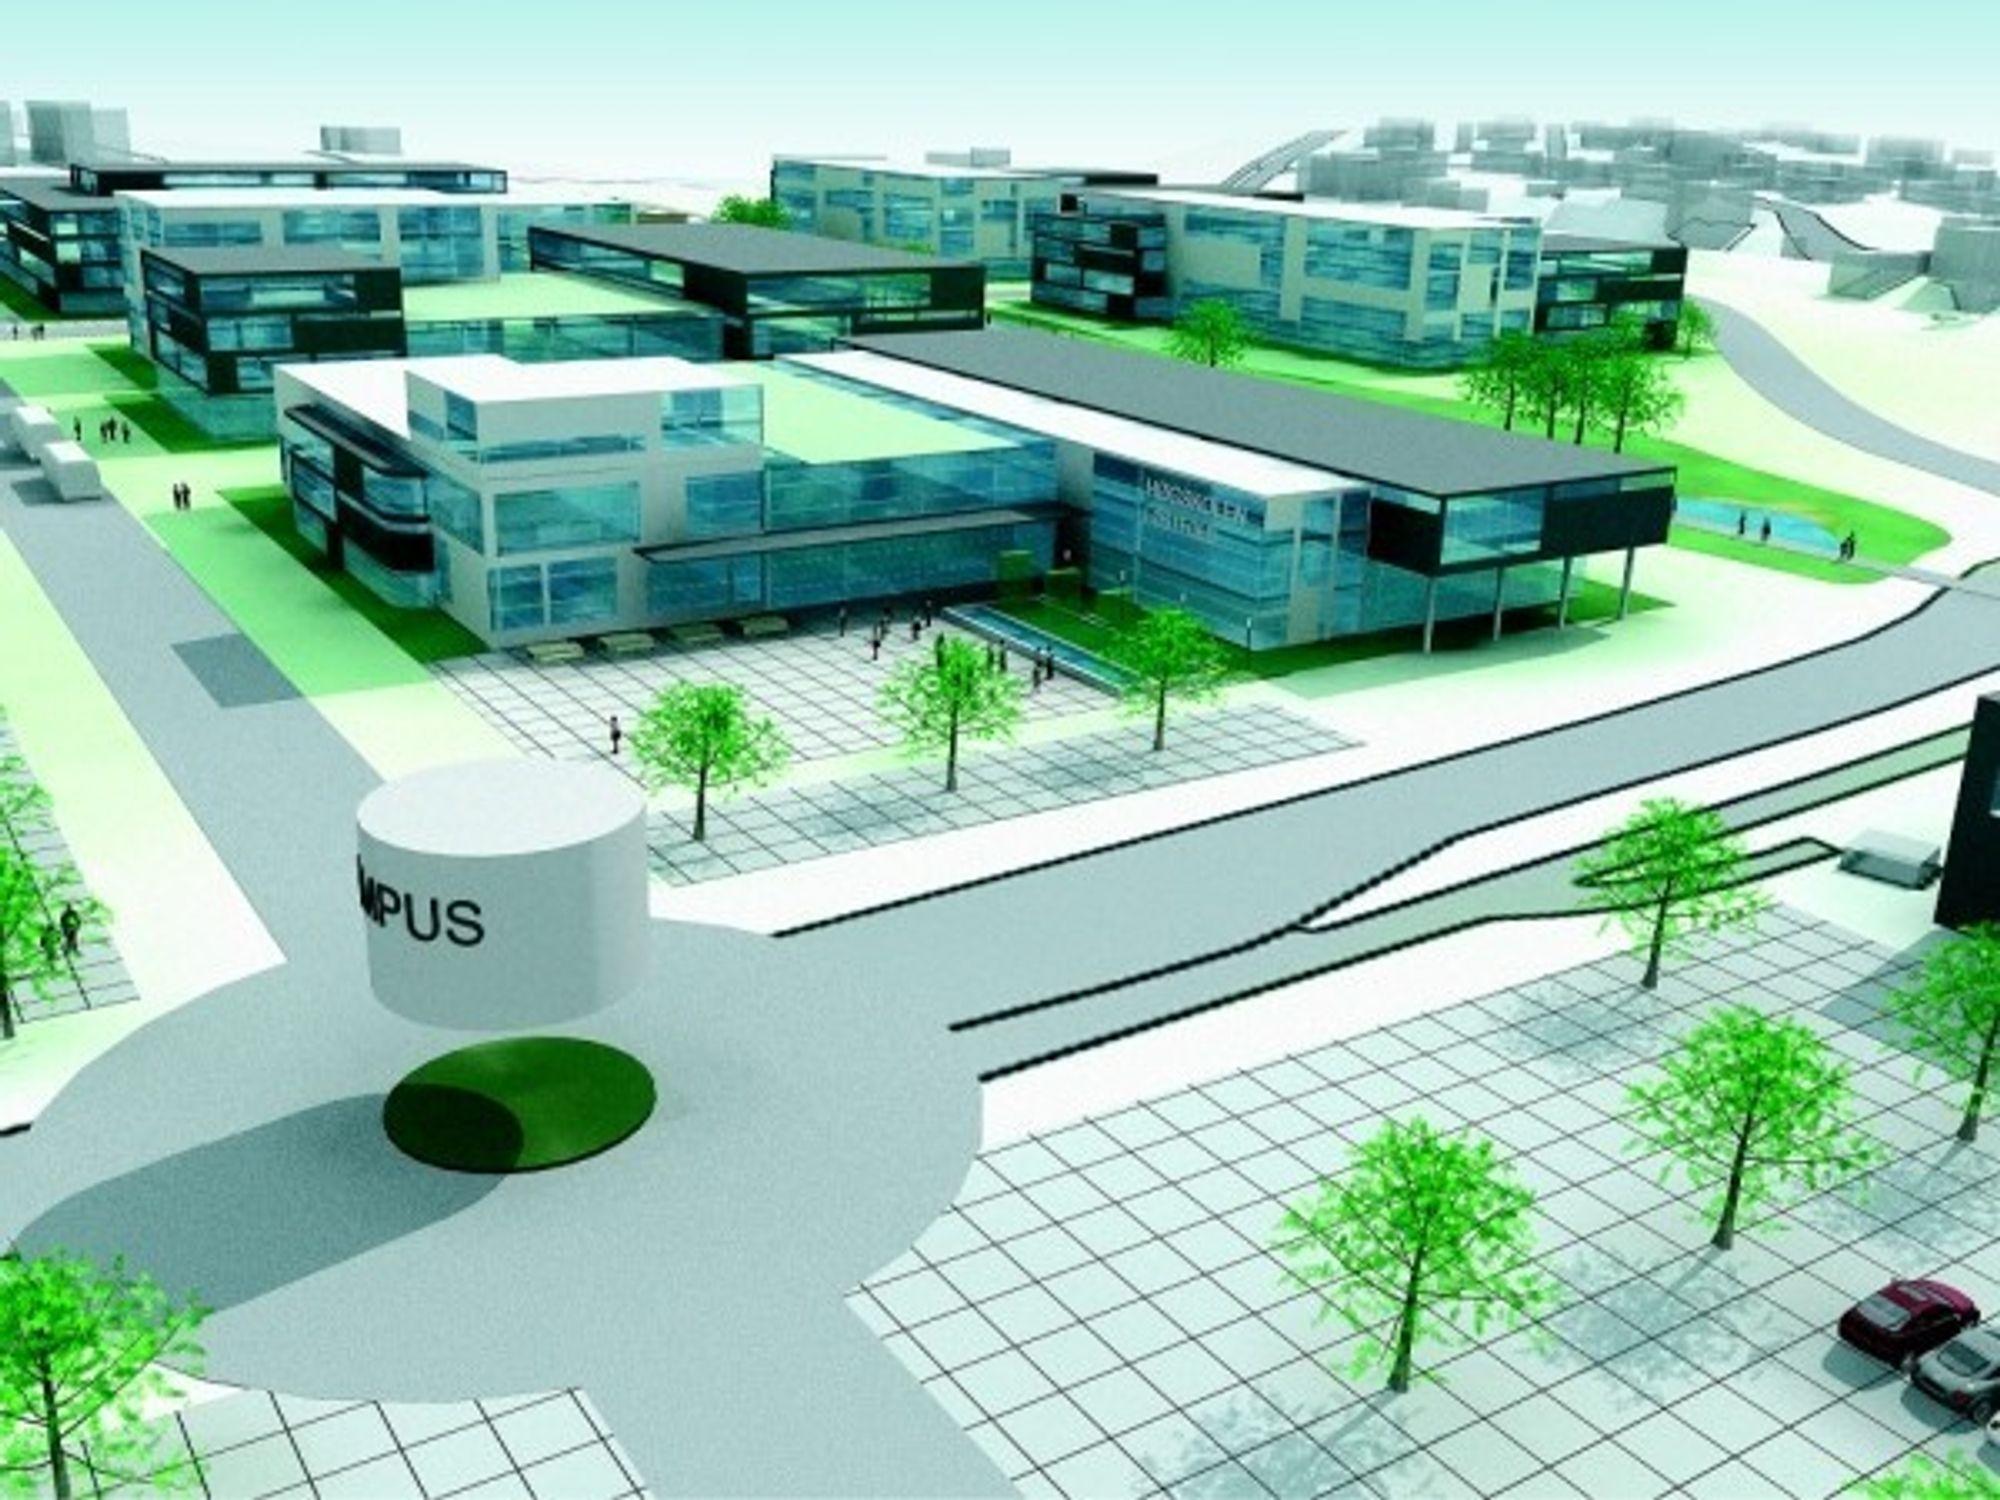 CAMPUS BORG: Slik ser Sarpsborg kommune for seg at den nye Campus Borg blir.